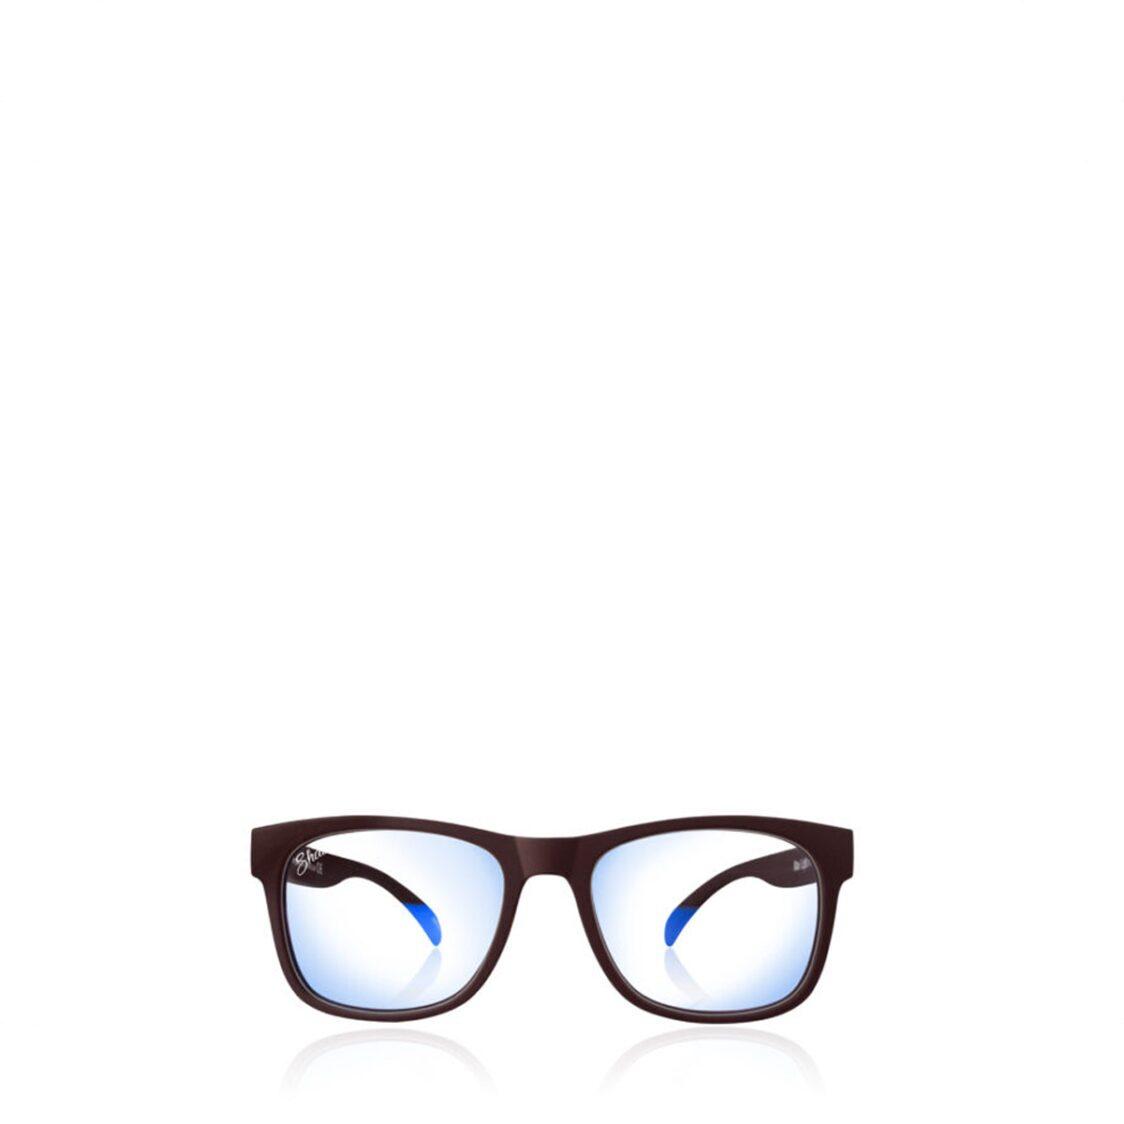 Shadez Eyewear Blue Light Brown Junior Aged 3-7 Years Old SHZ-119